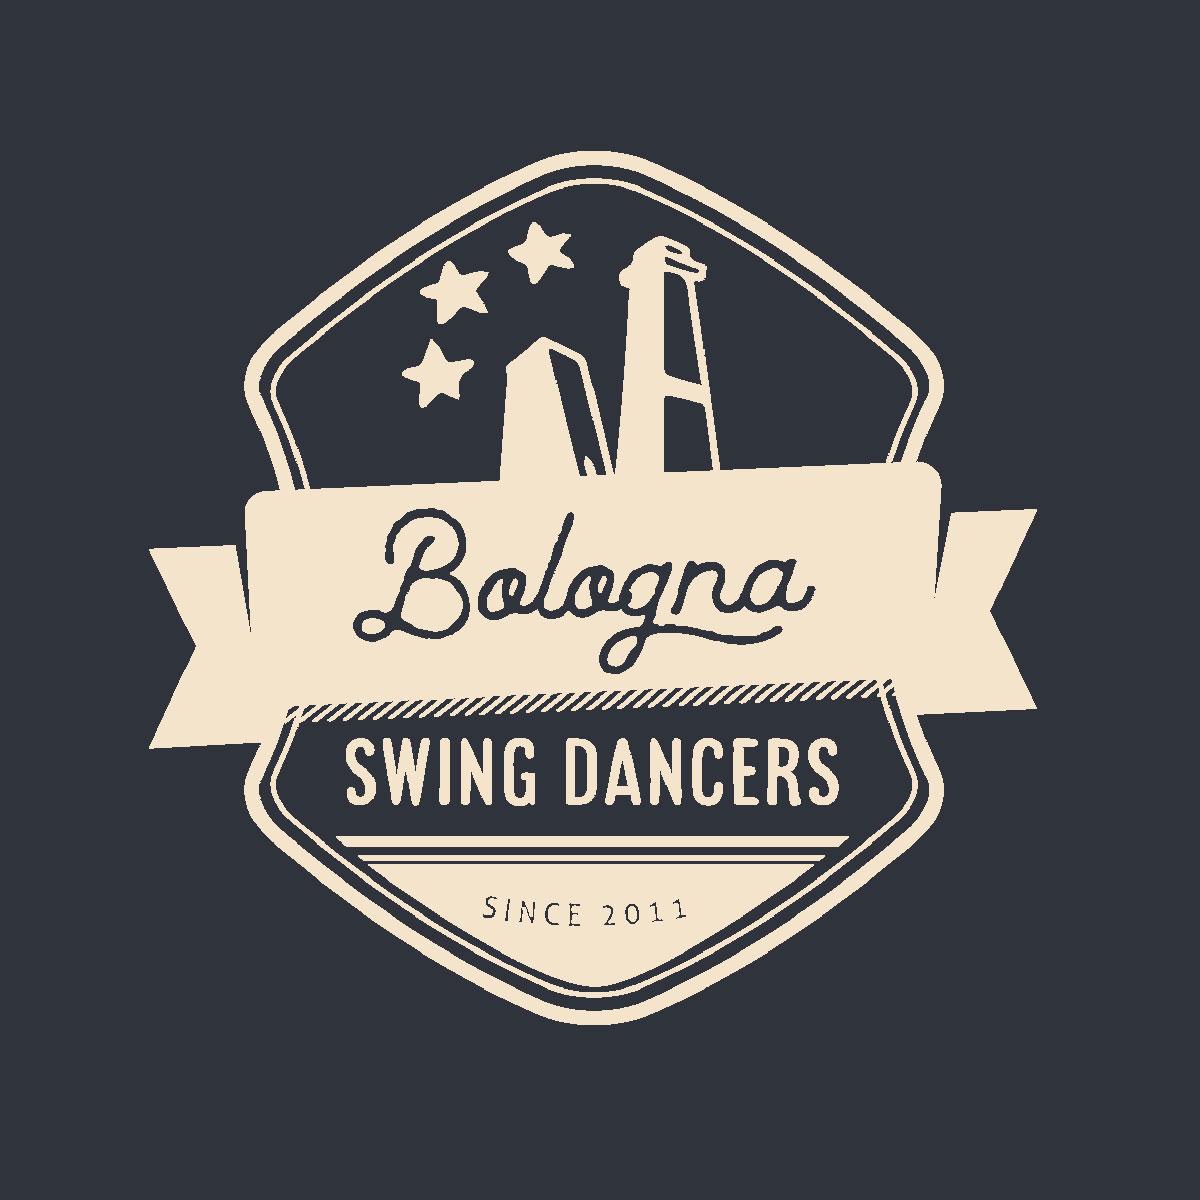 Bologna Swing Dancers